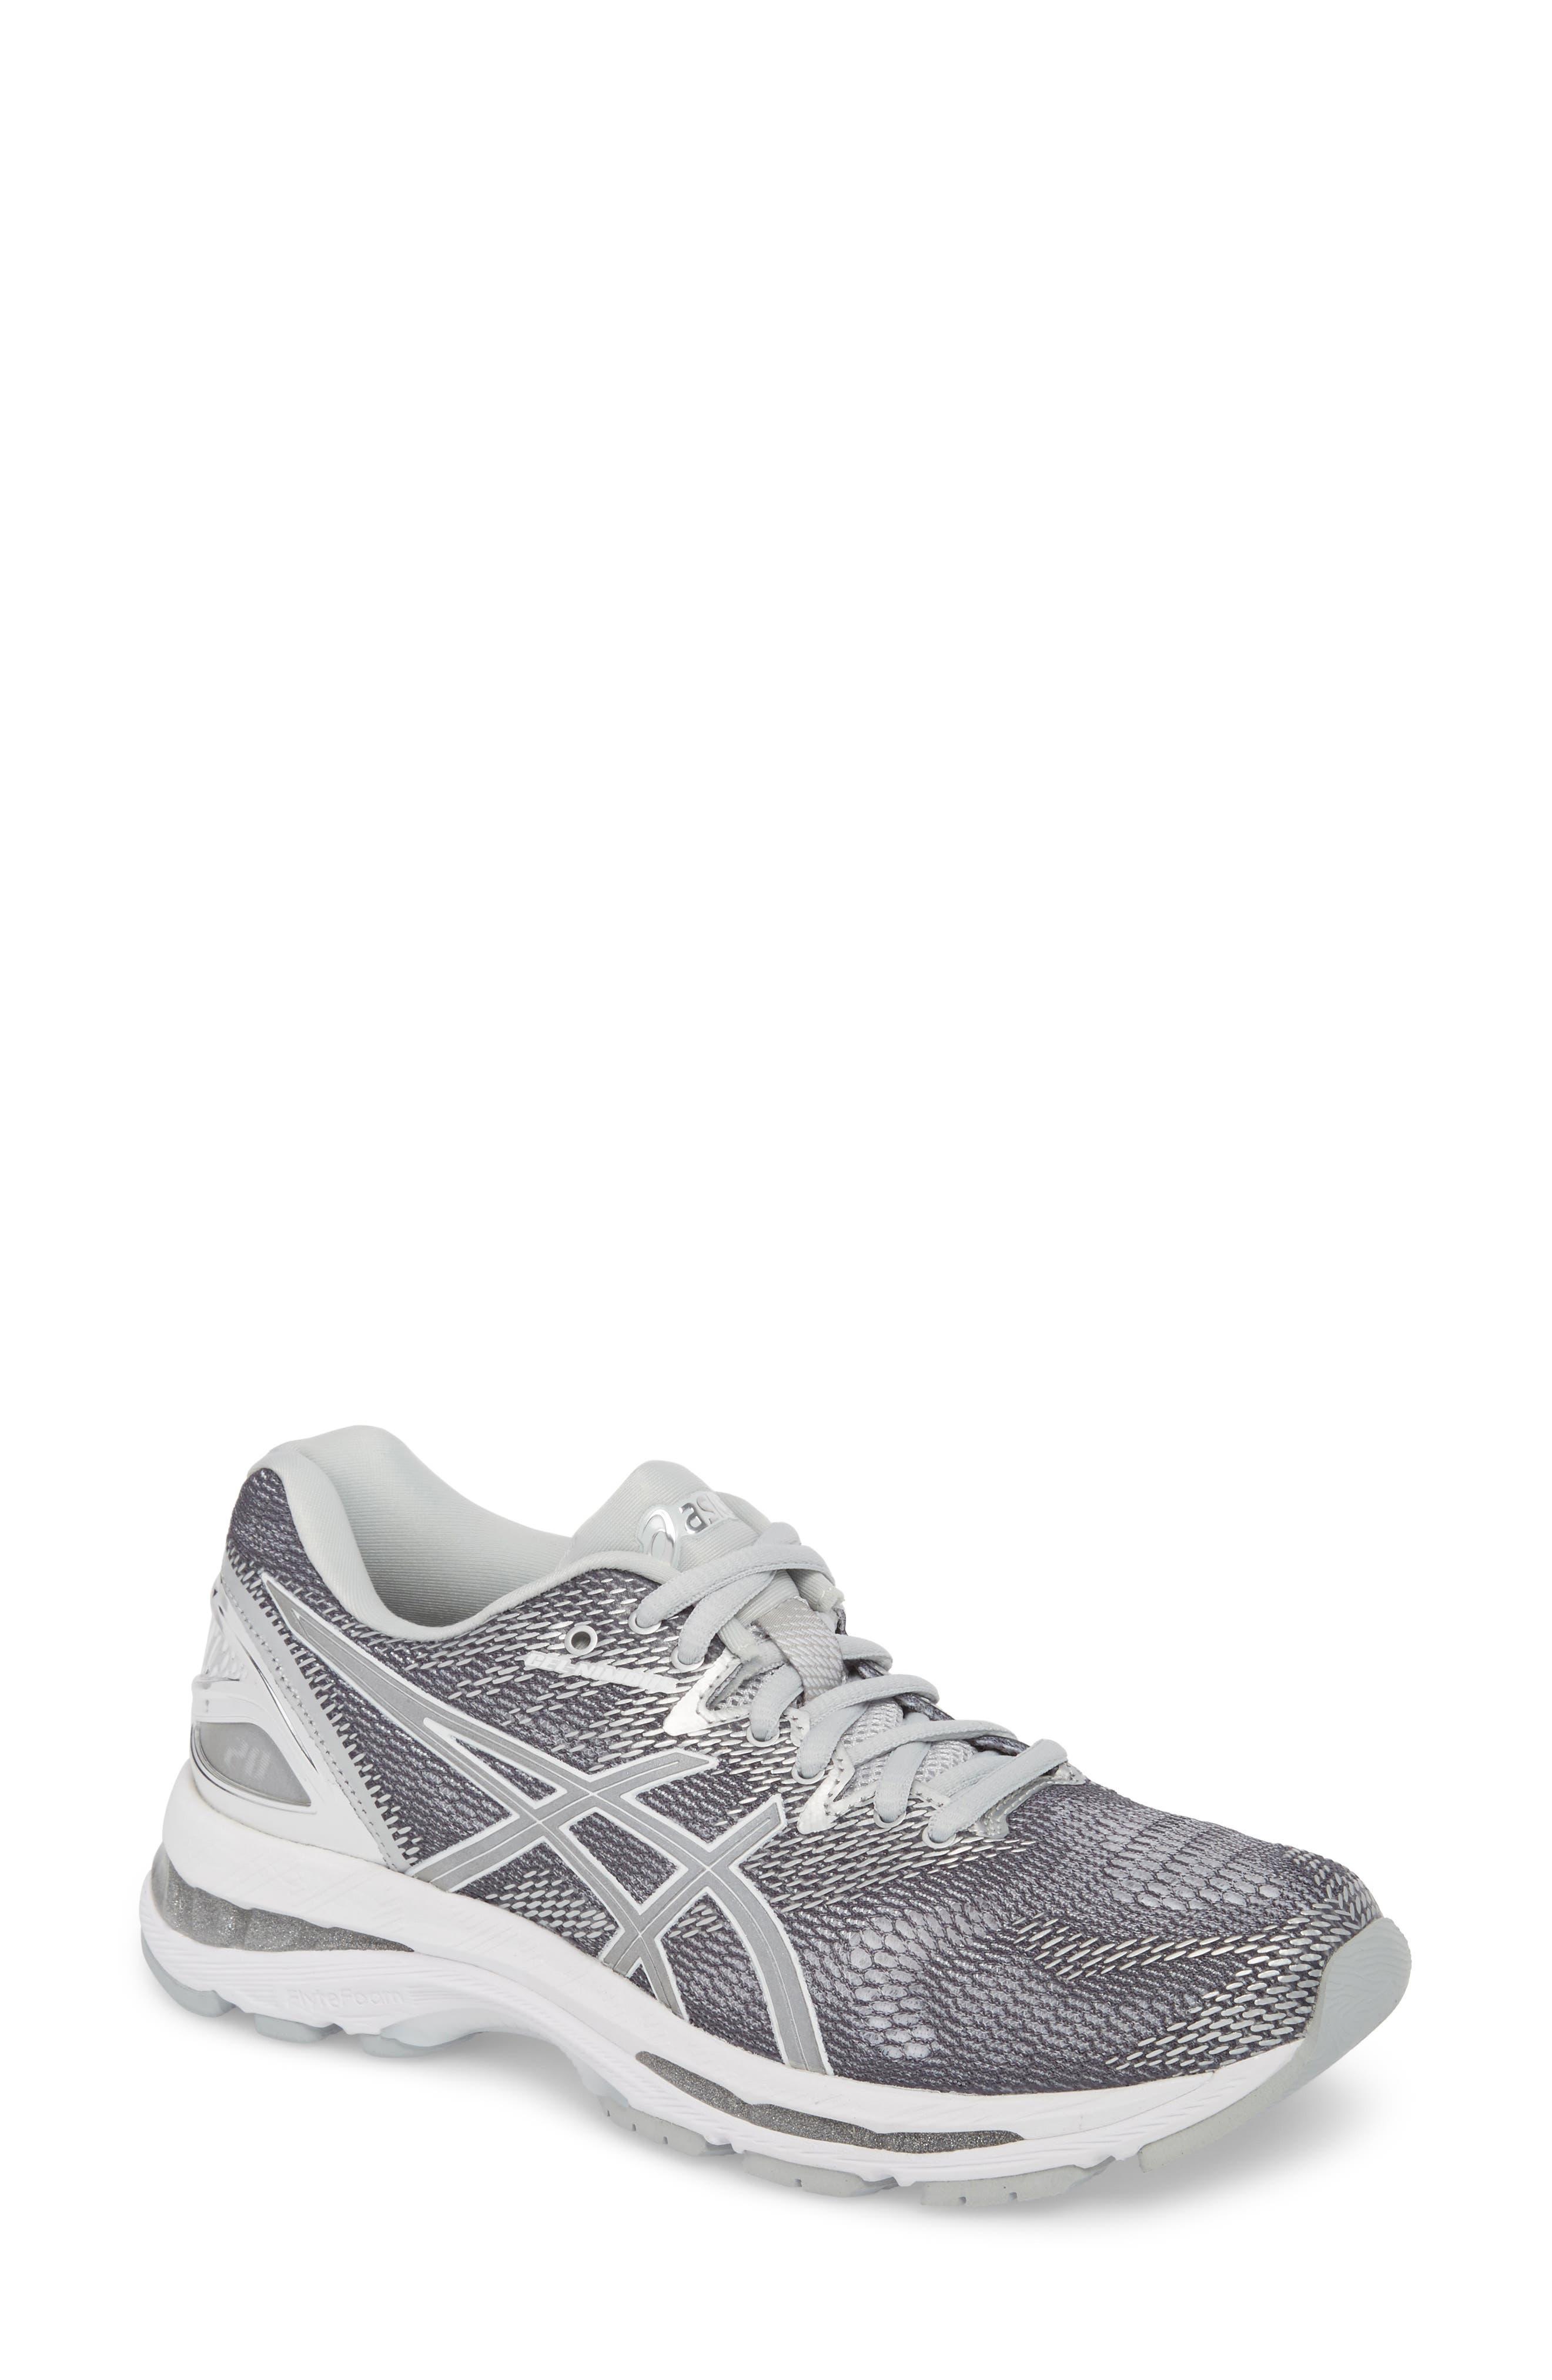 ASICS® GEL-Nimbus 20 Platinum Running Shoe (Women)